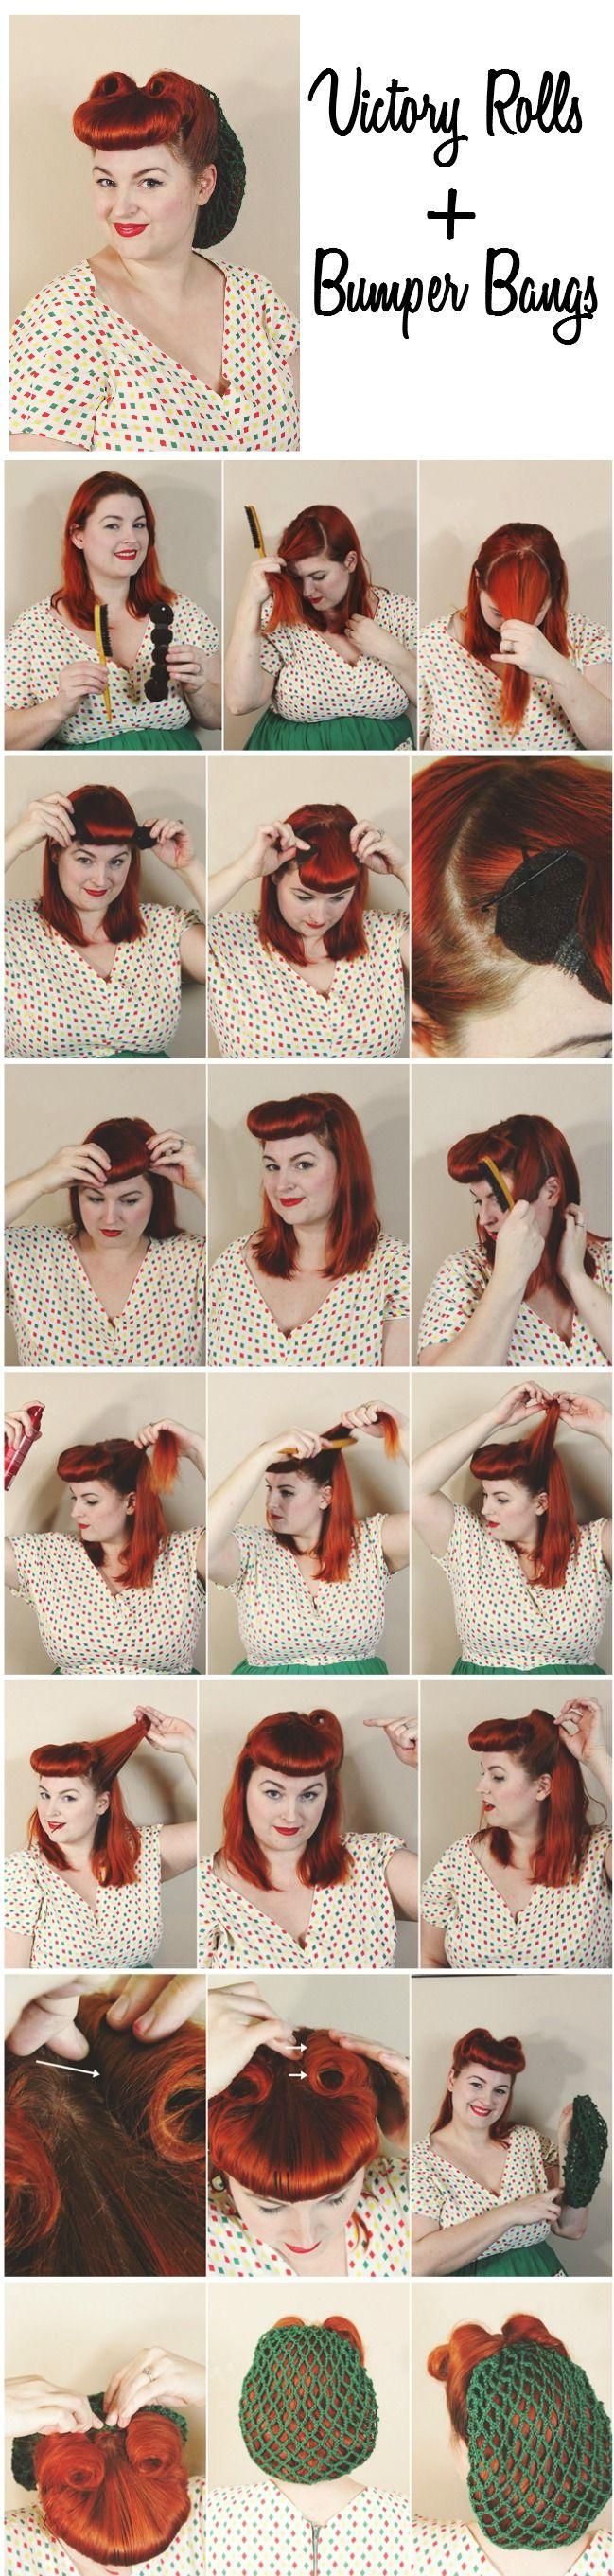 1940s hair bangs